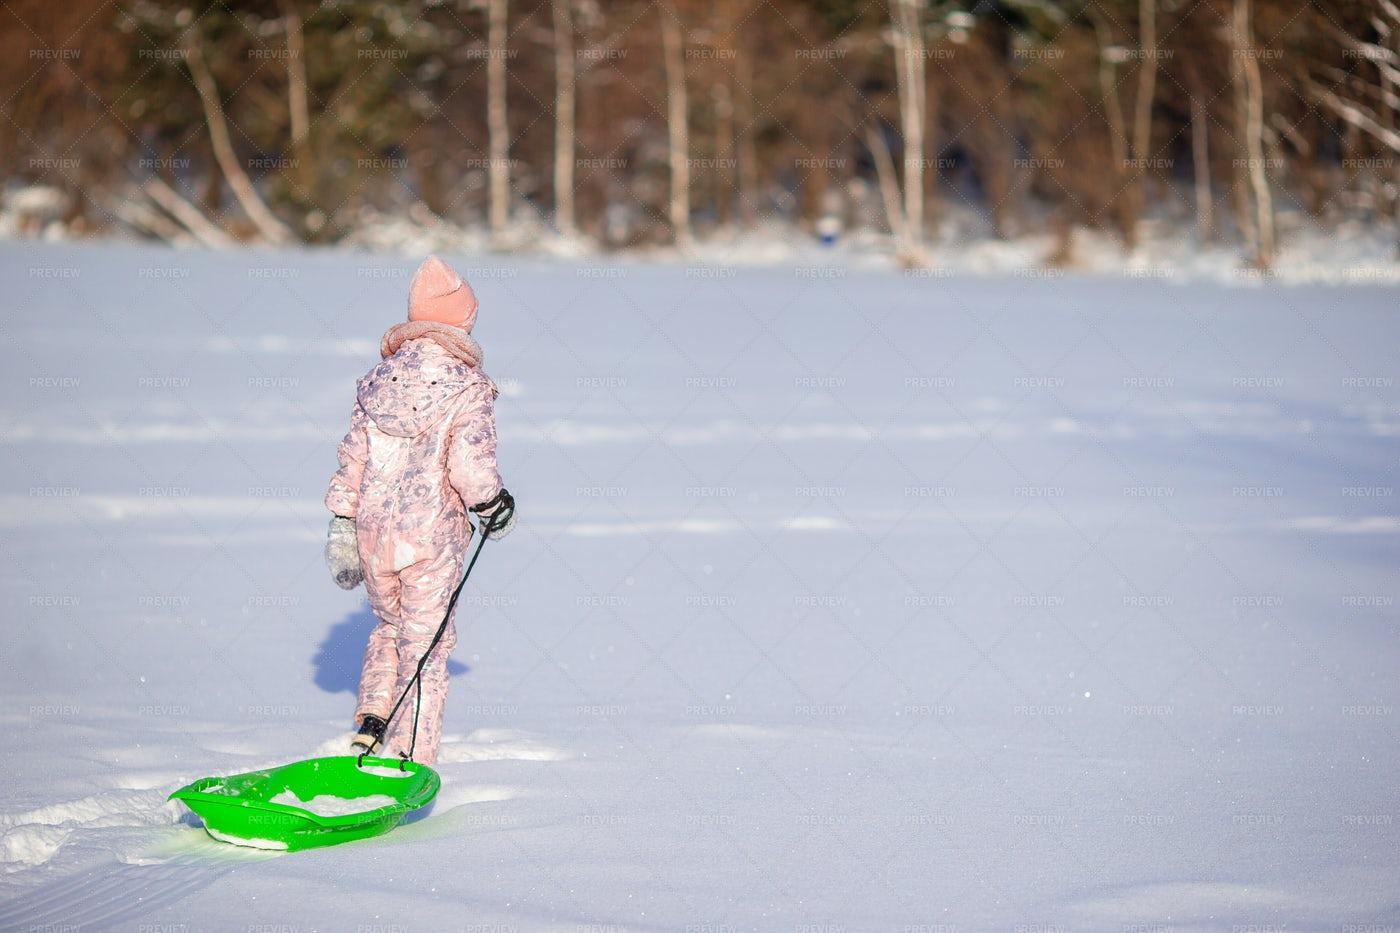 Girl Pulling Snow Sleigh: Stock Photos